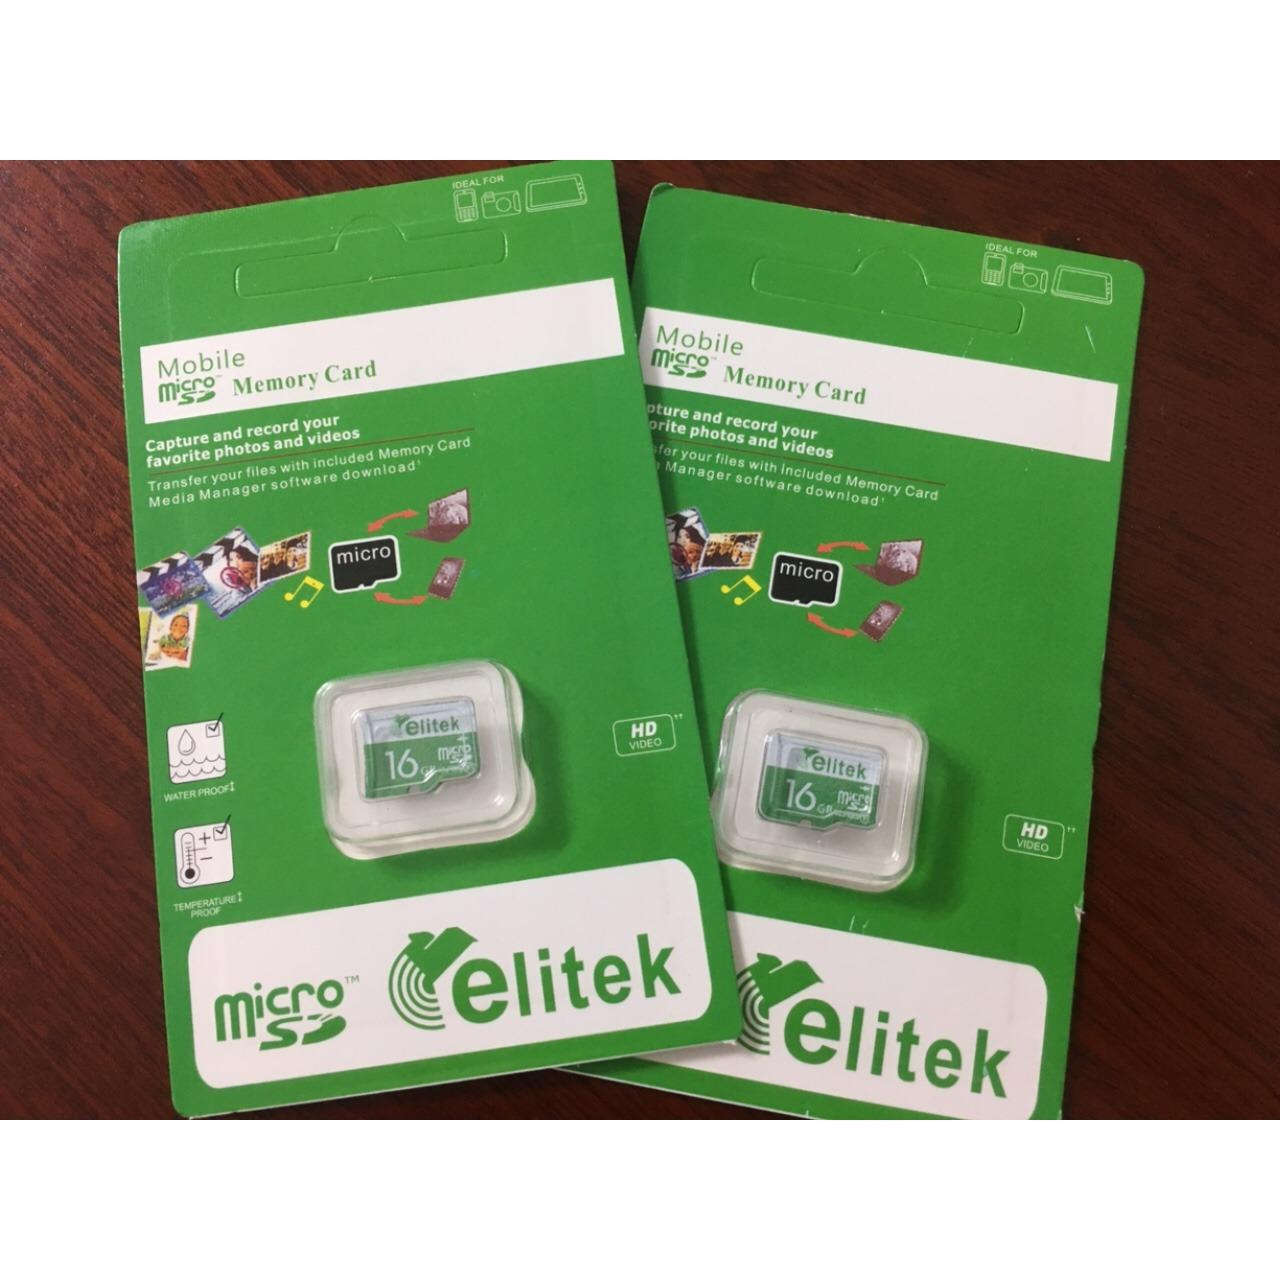 Combo 2 Thẻ Nhớ Micro Elitek Sd 16Gb Oem Chiết Khấu